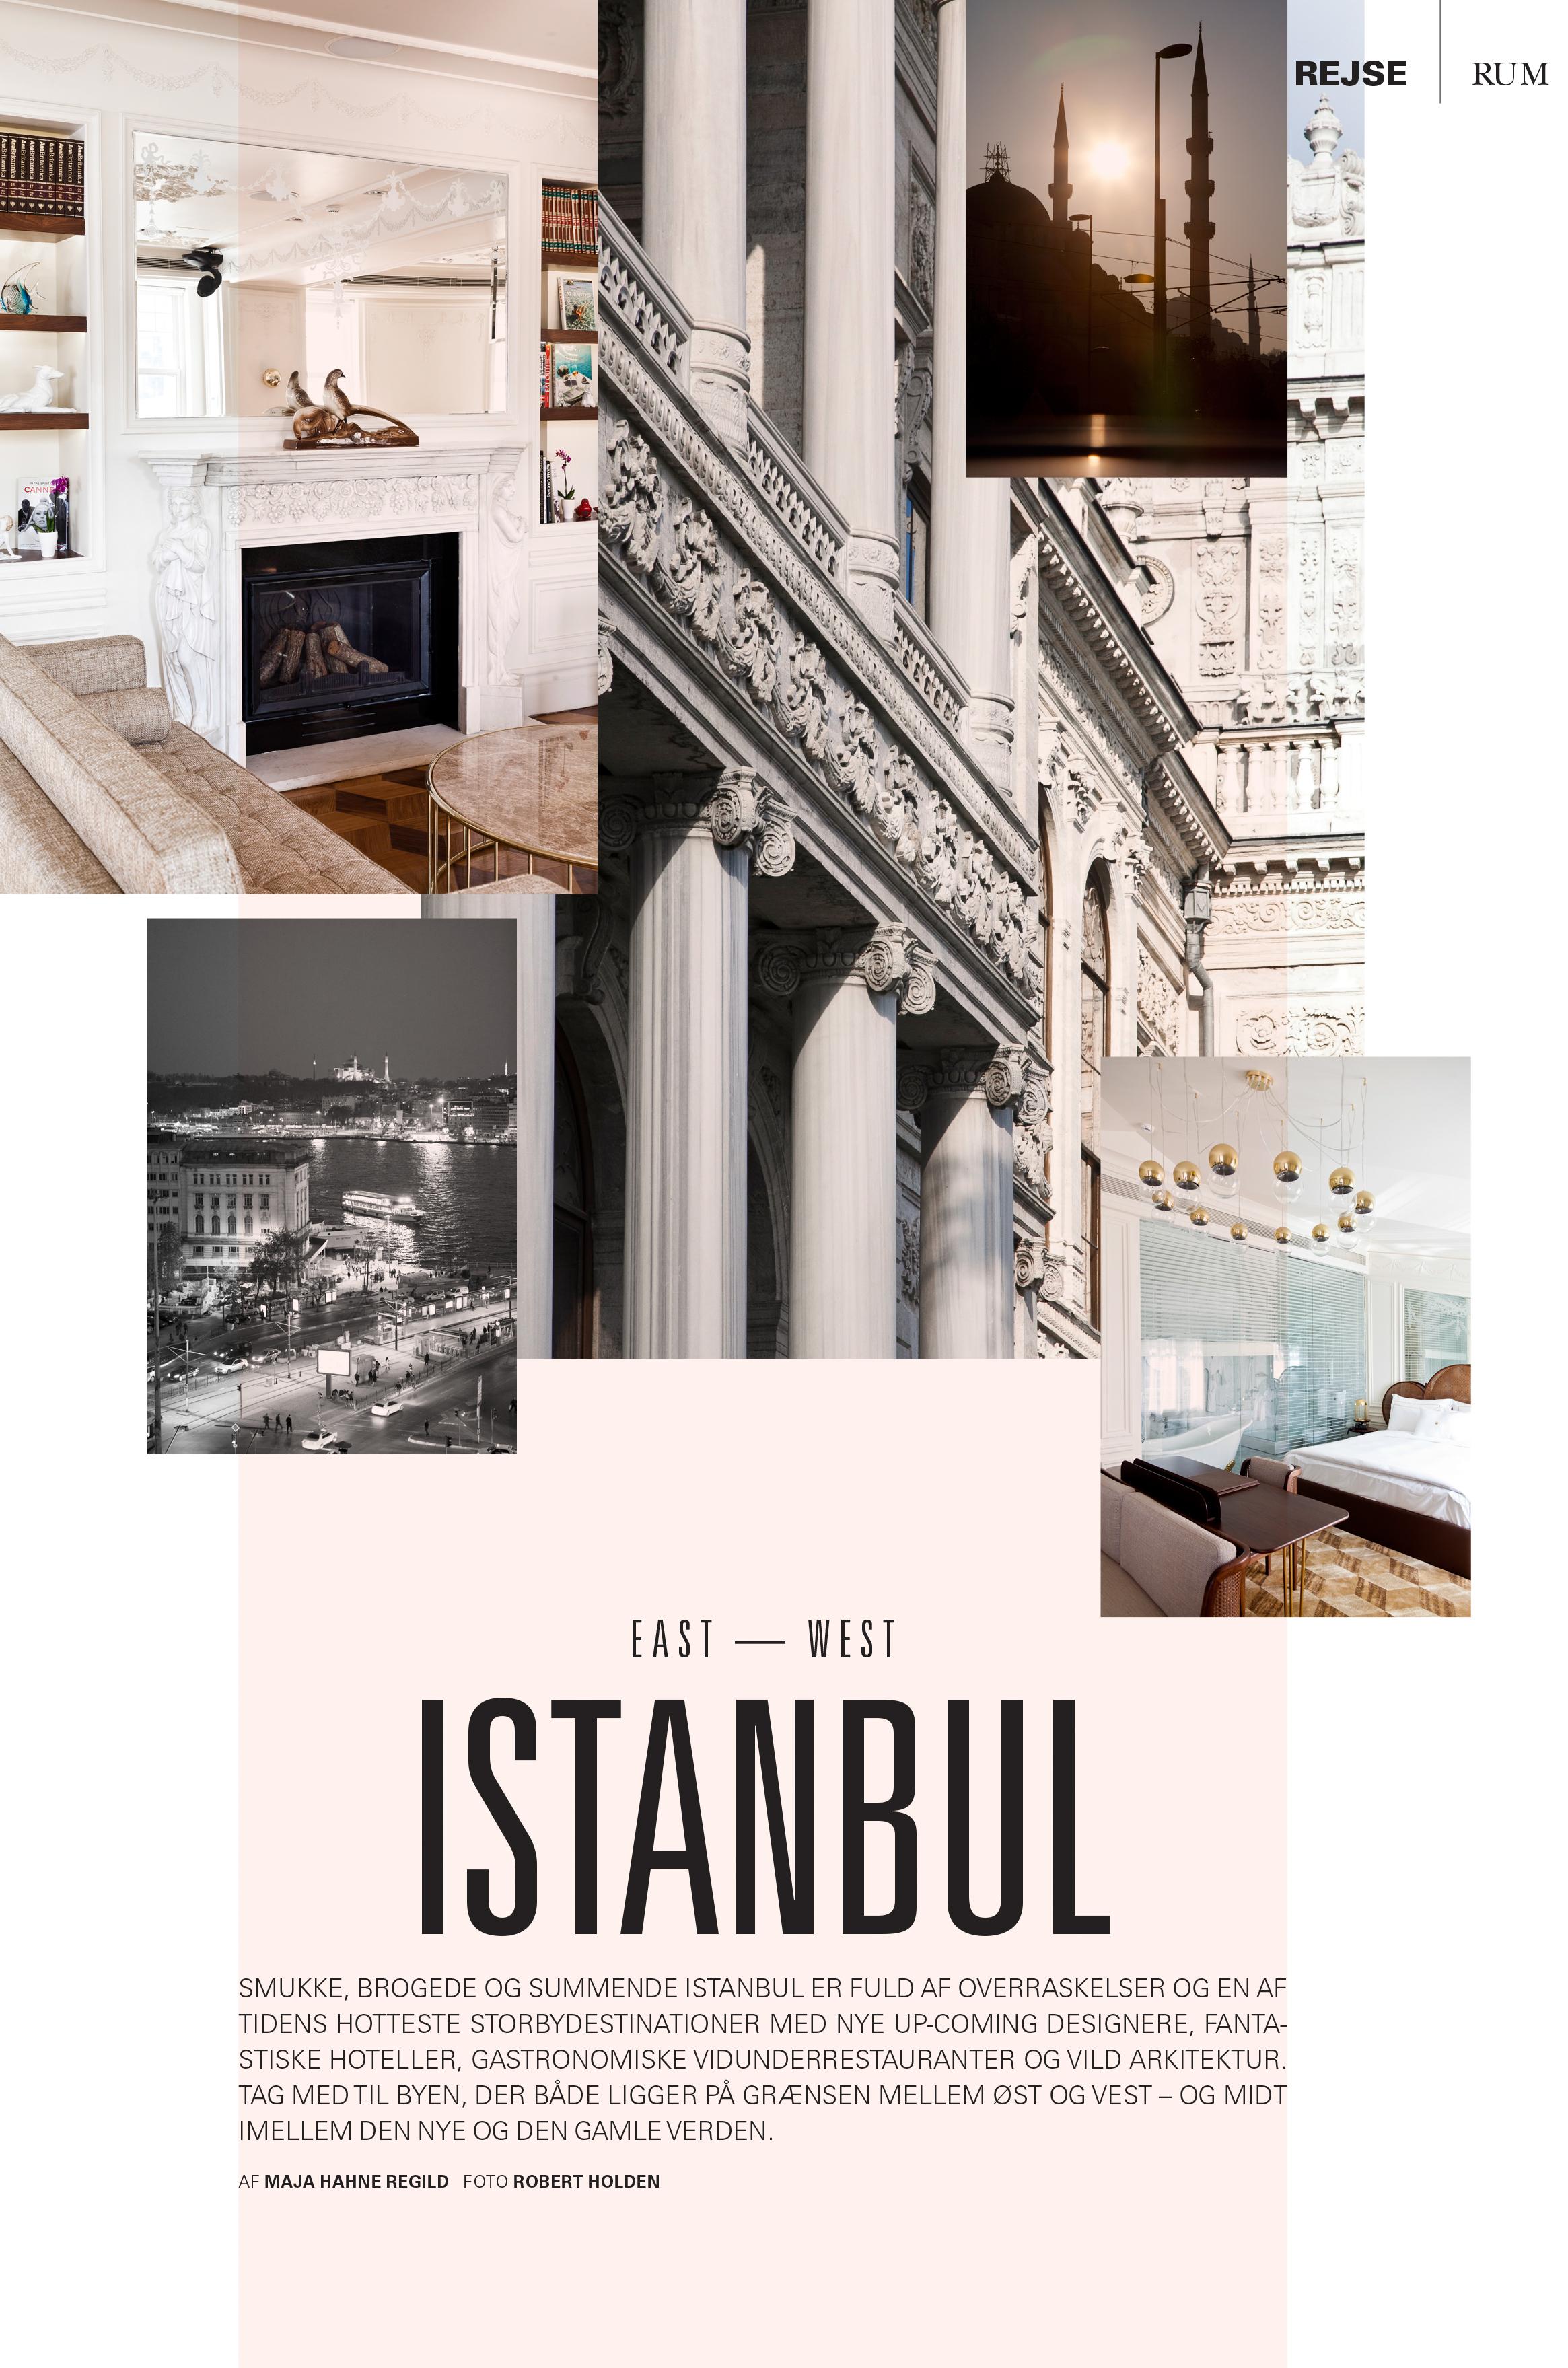 14_dk_rum_11_Istanbul_KORR_NY2_2.indd